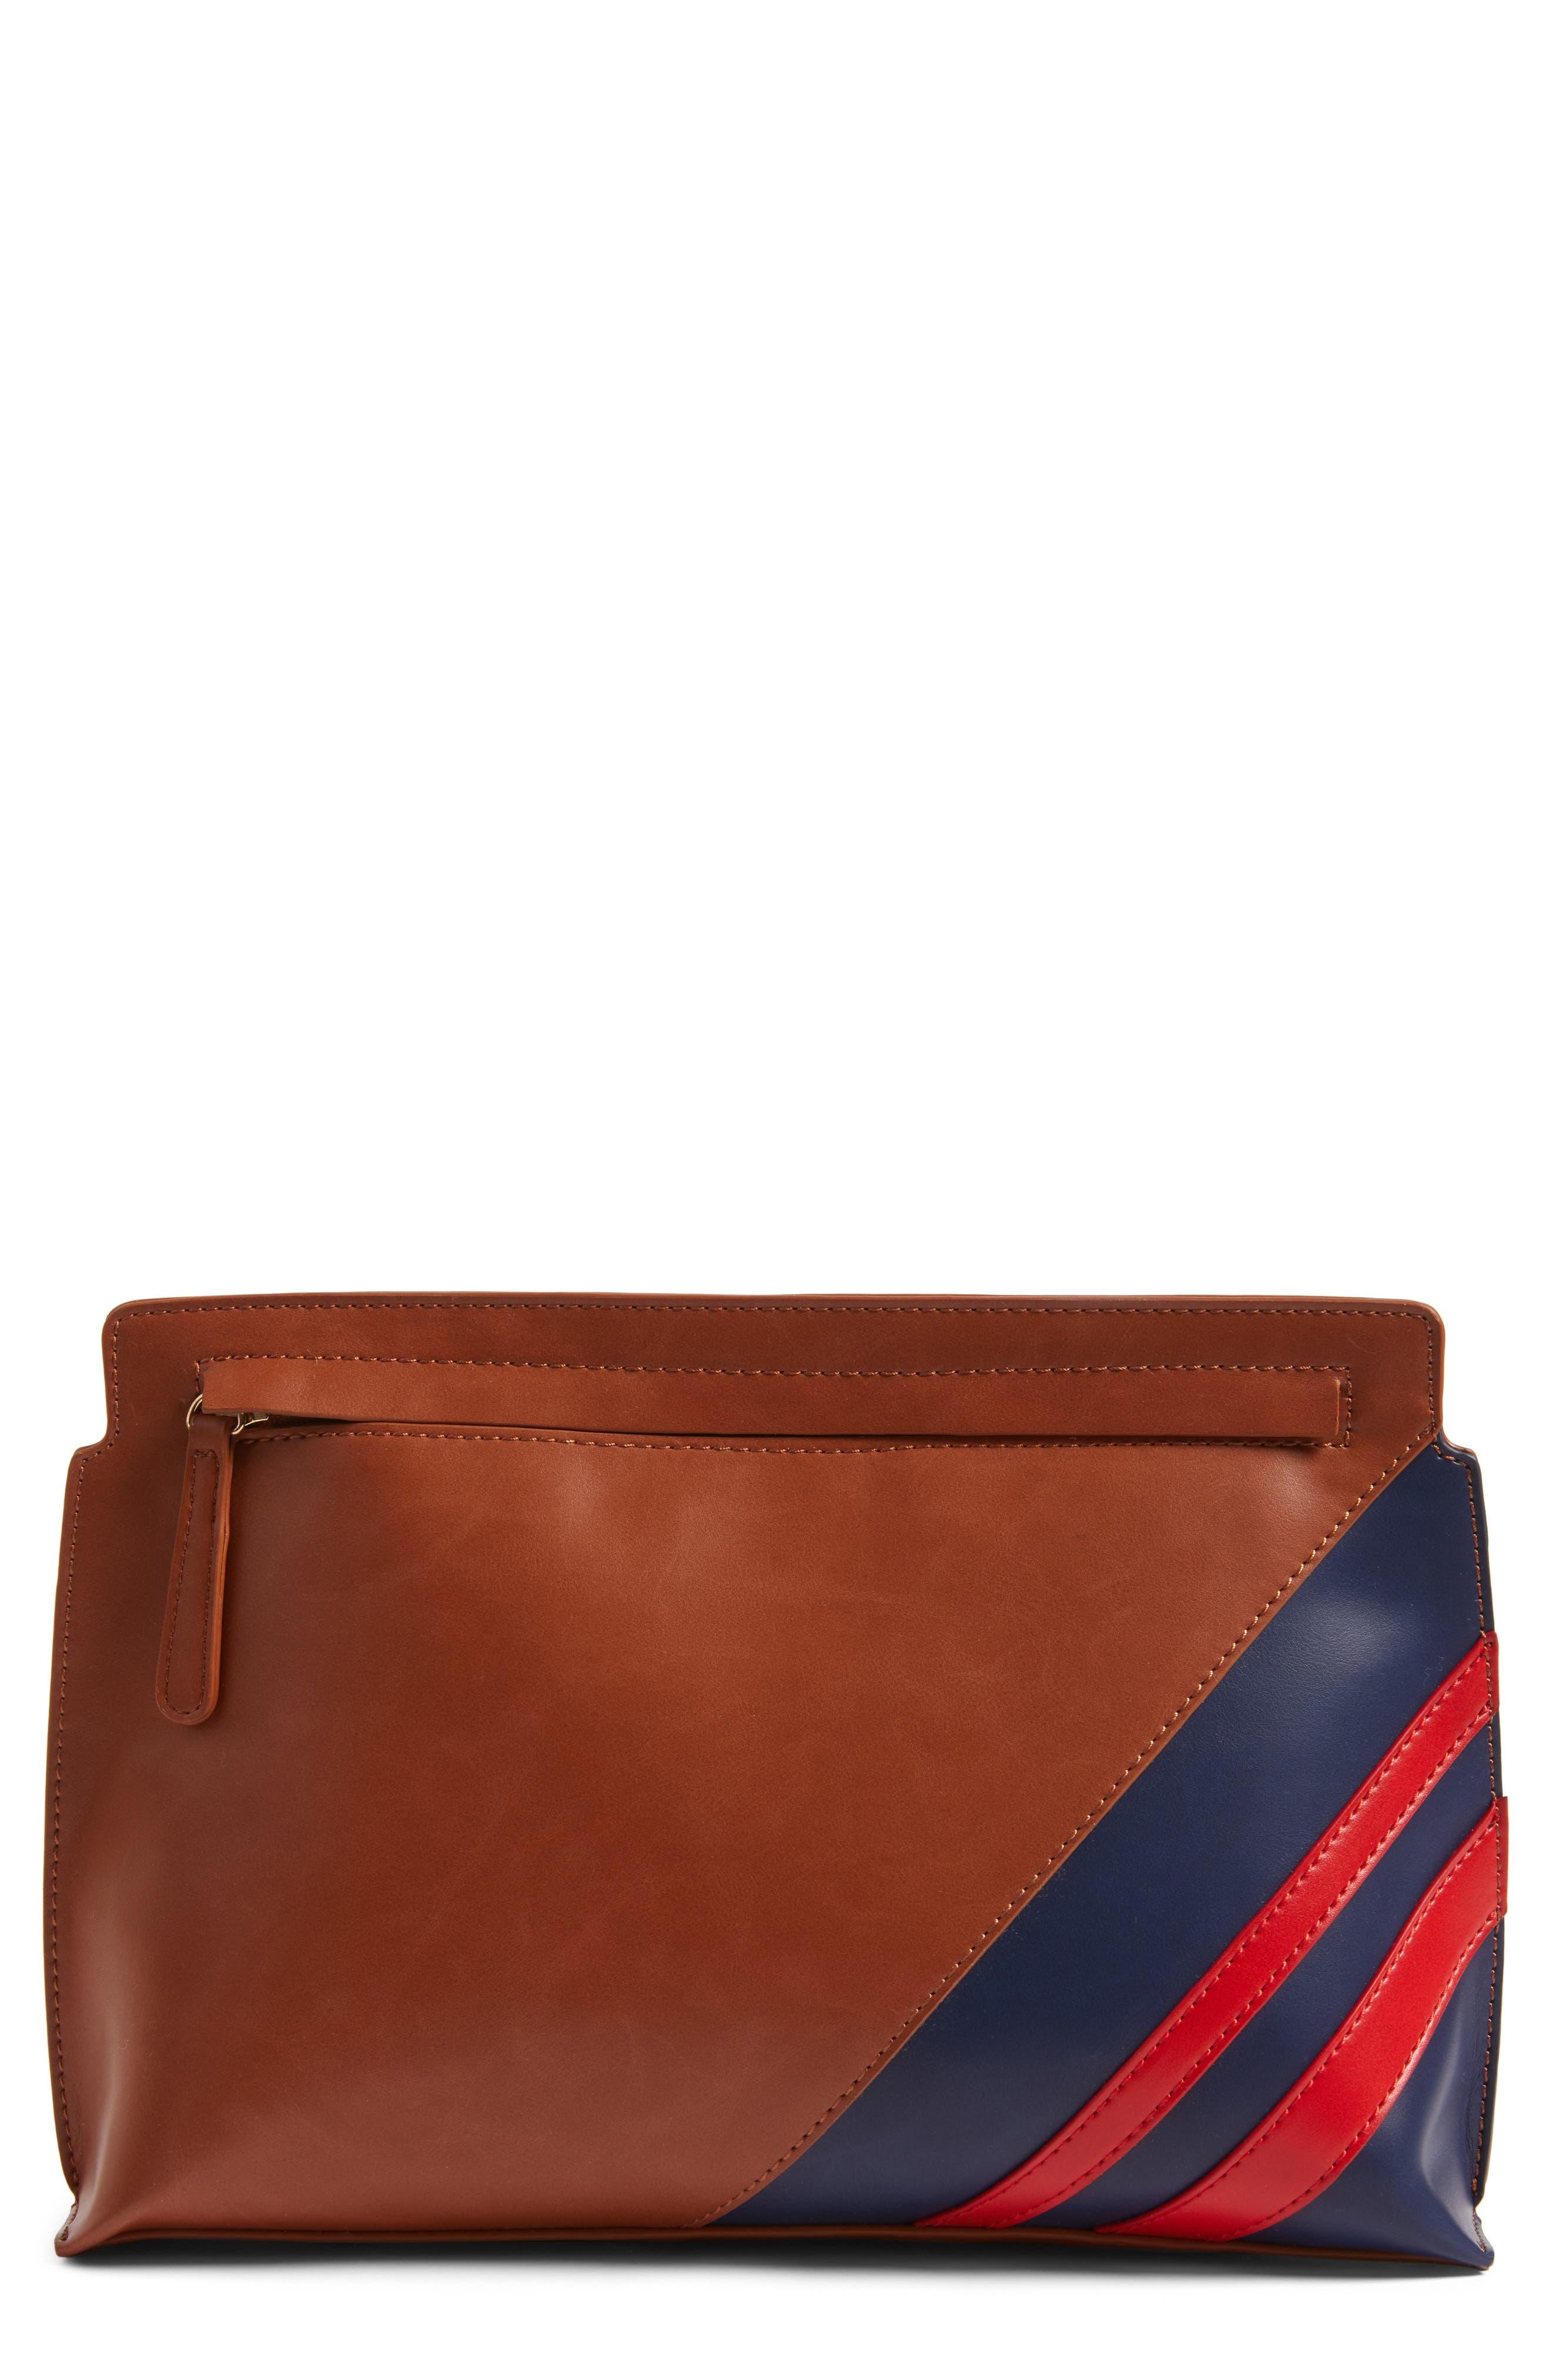 BP. Stripe Faux Leather Clutch